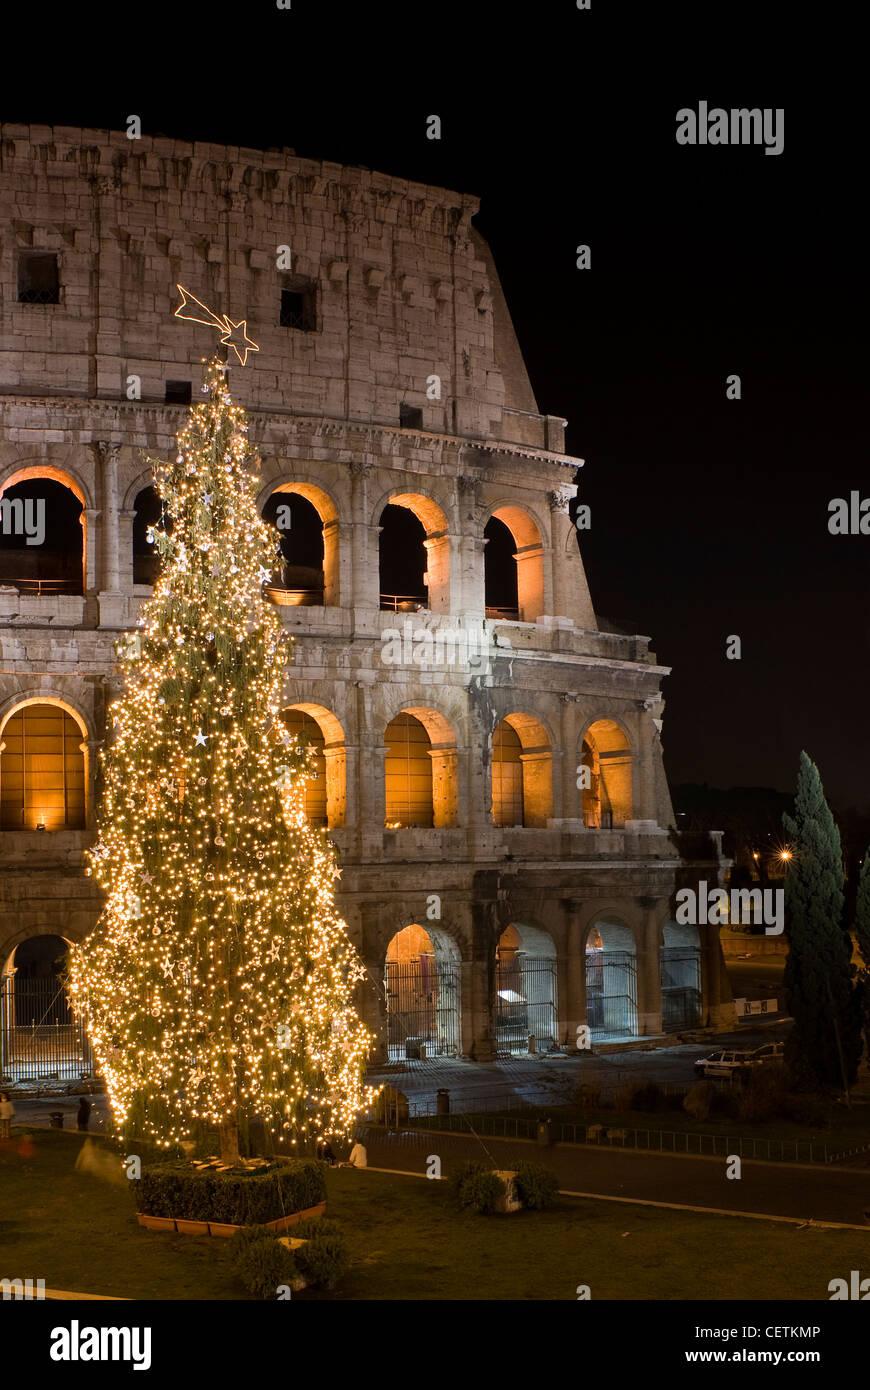 Kolosseum an Weihnachten Zeit, Rom, Latium, Italien Stockfoto, Bild ...